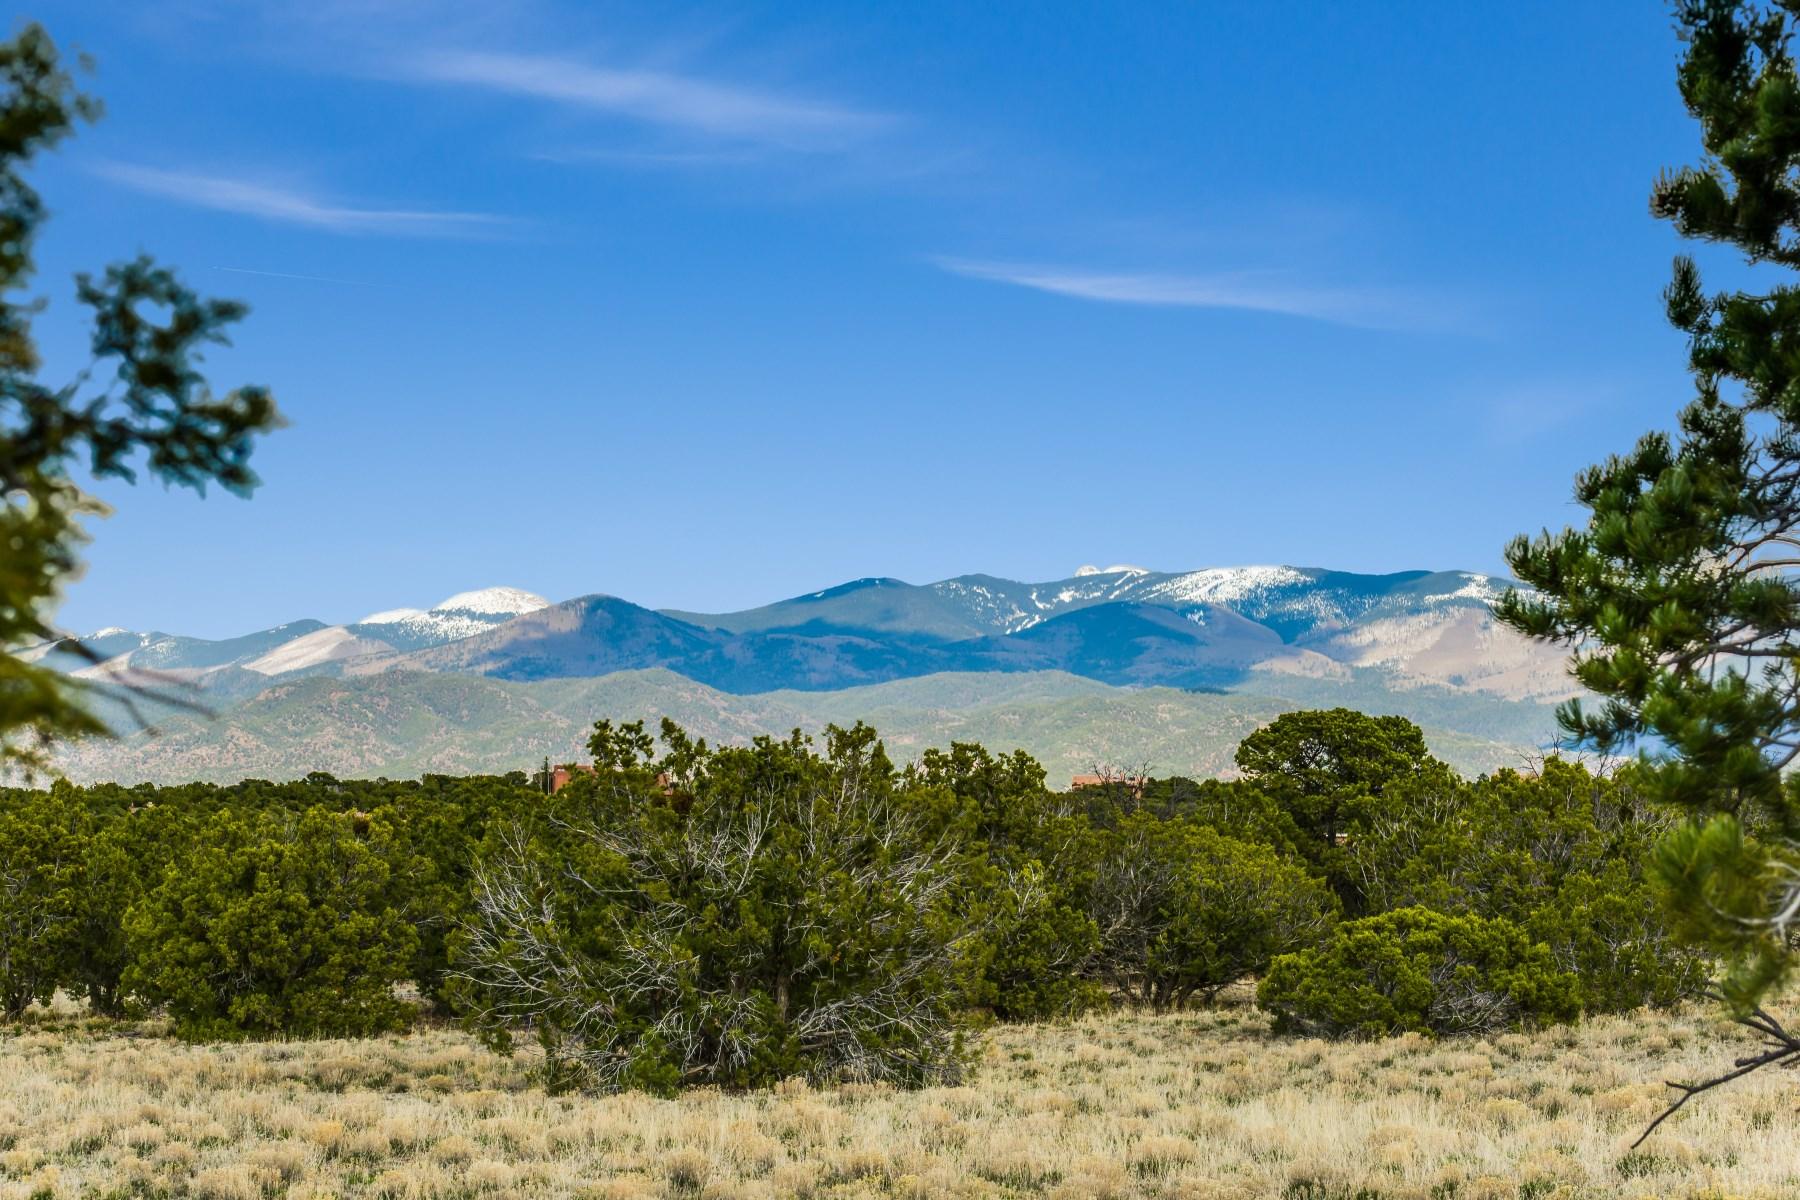 Land for Sale at Rancho Manana, 10 +- Acres Santa Fe, New Mexico, 87506 United States